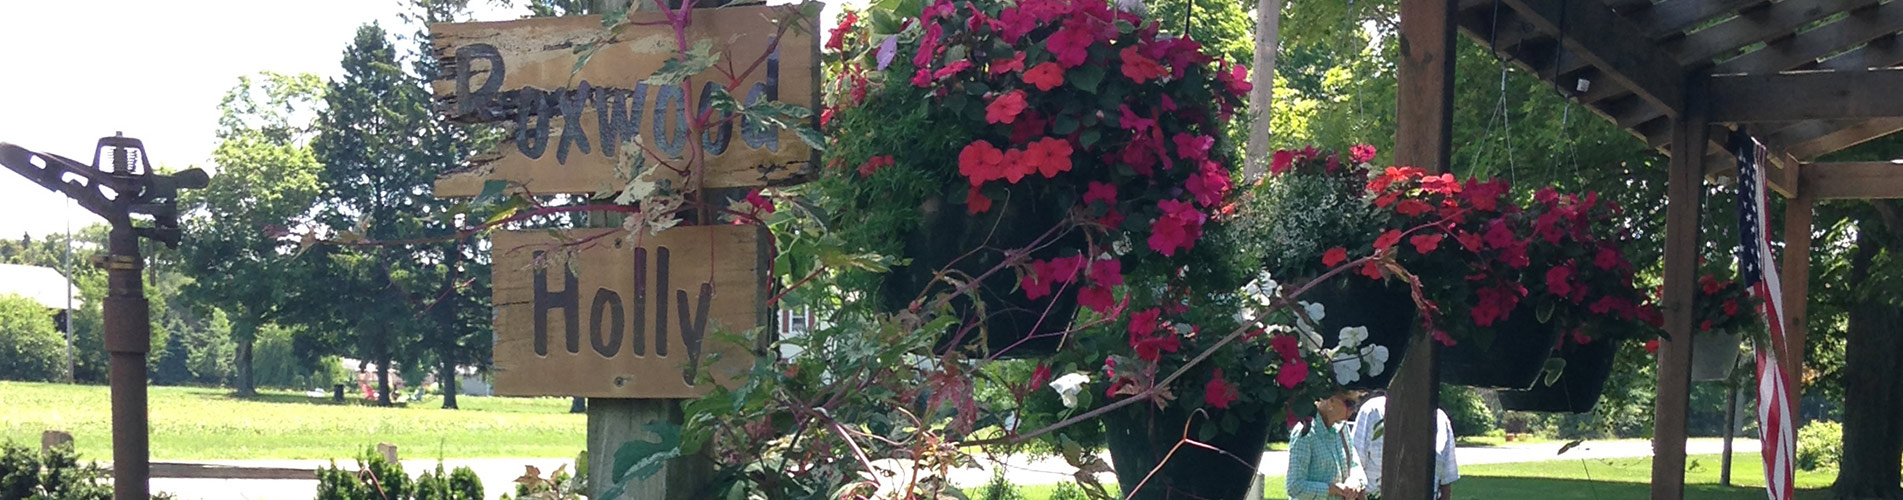 Nursery Grown Plants Services In Fennville Mi